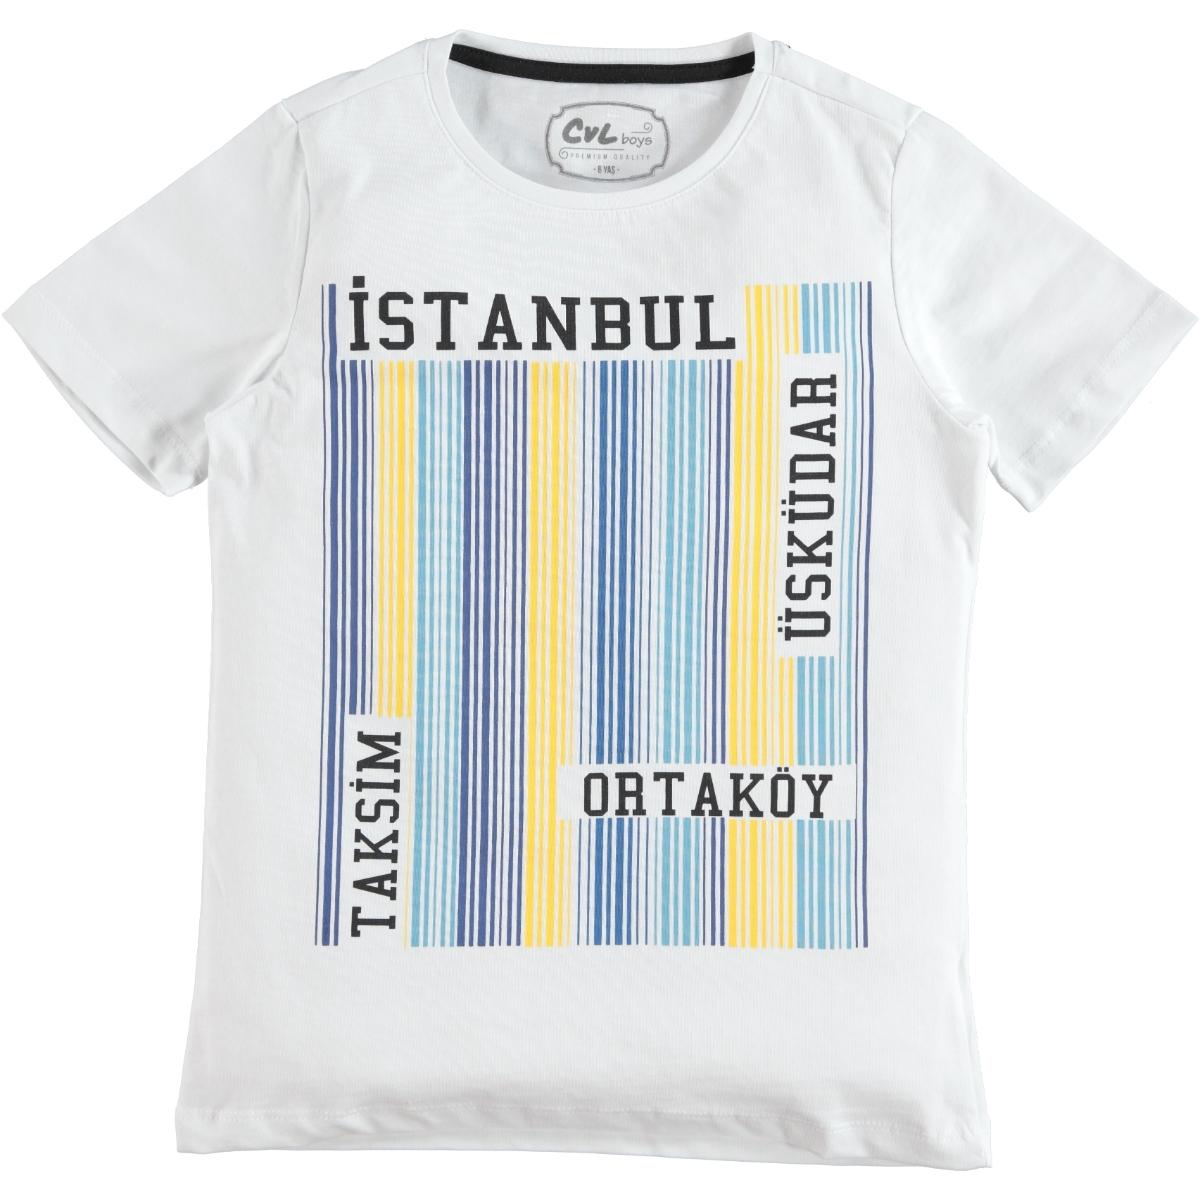 Cvl Boy T-Shirt White Ages 6-9